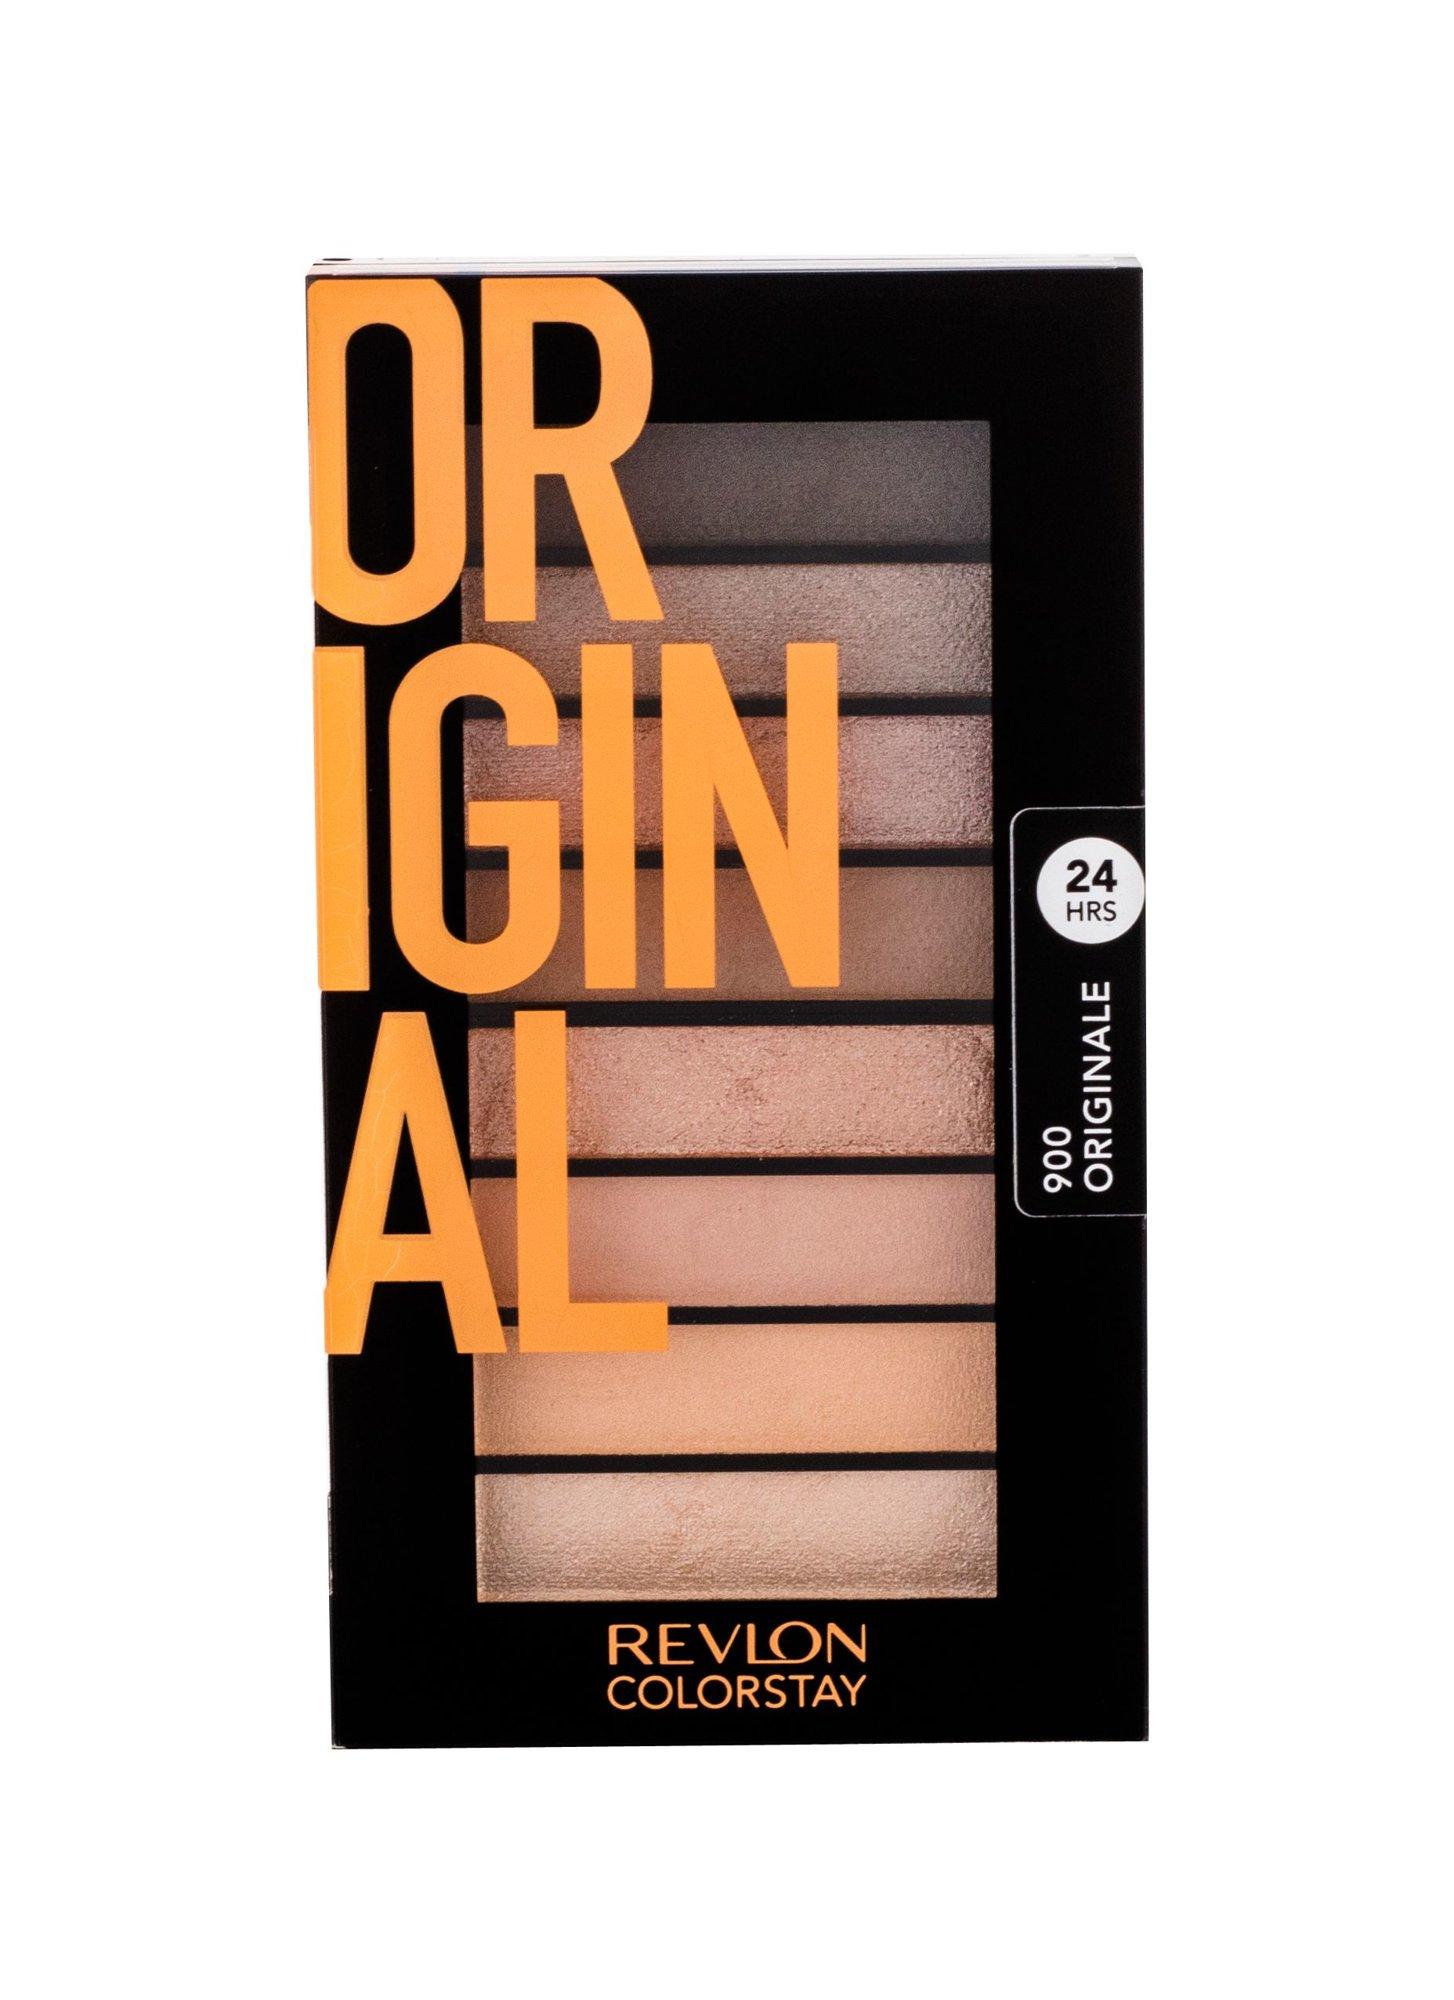 Revlon Colorstay Eye Shadow 3,4ml 900 Original